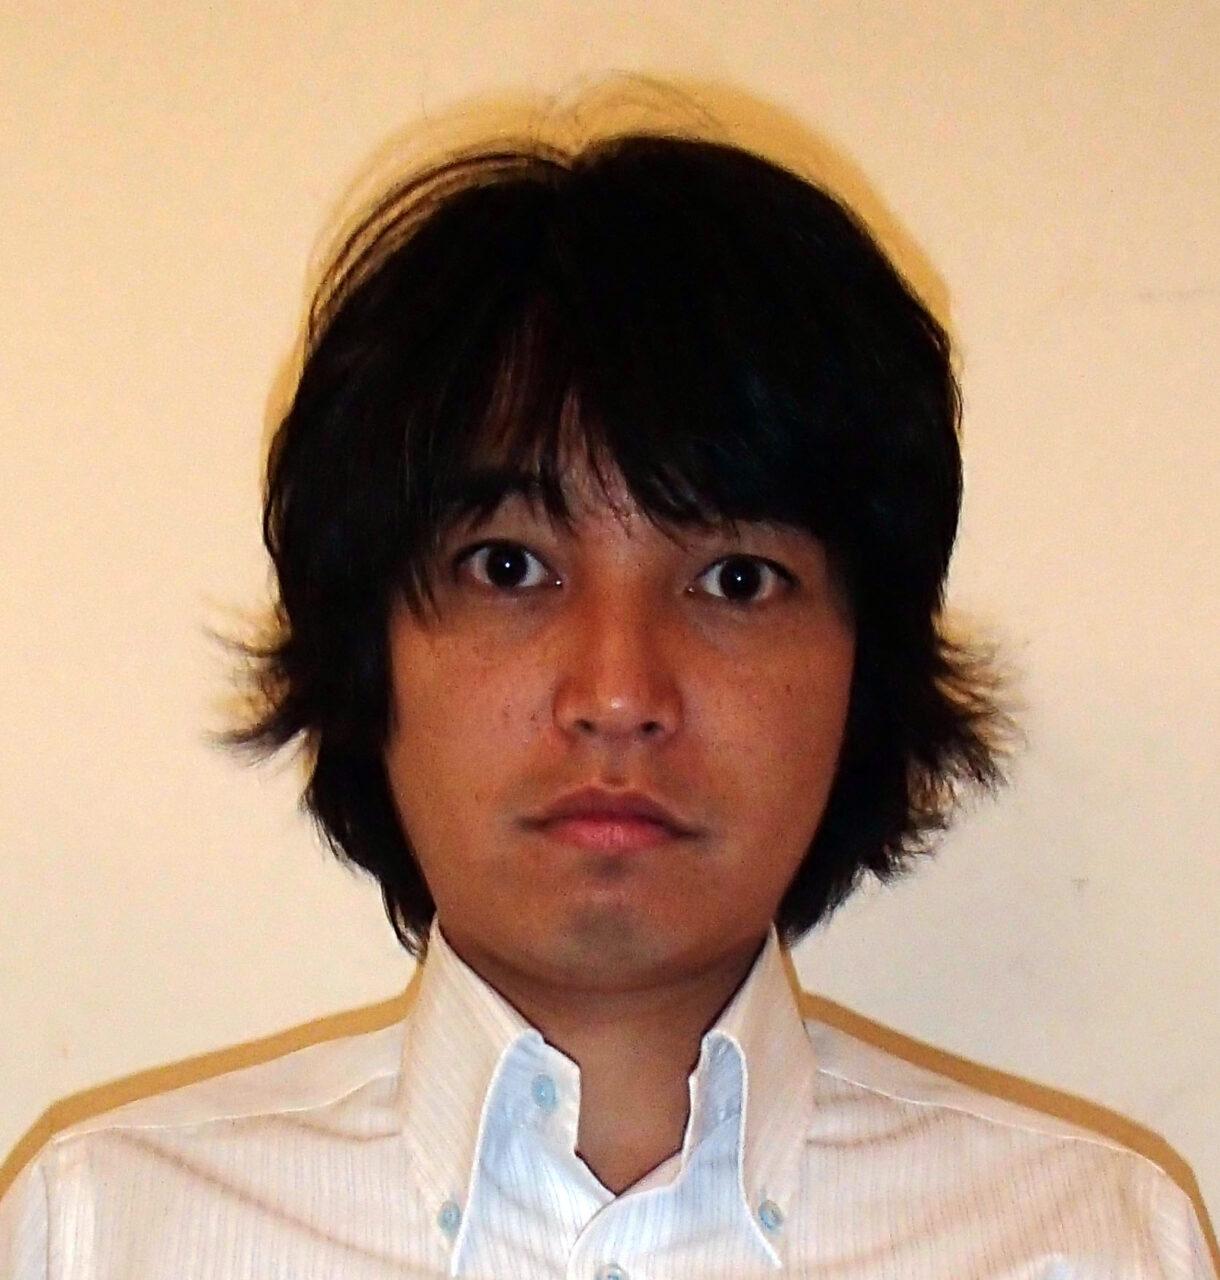 Masahiro_Morita